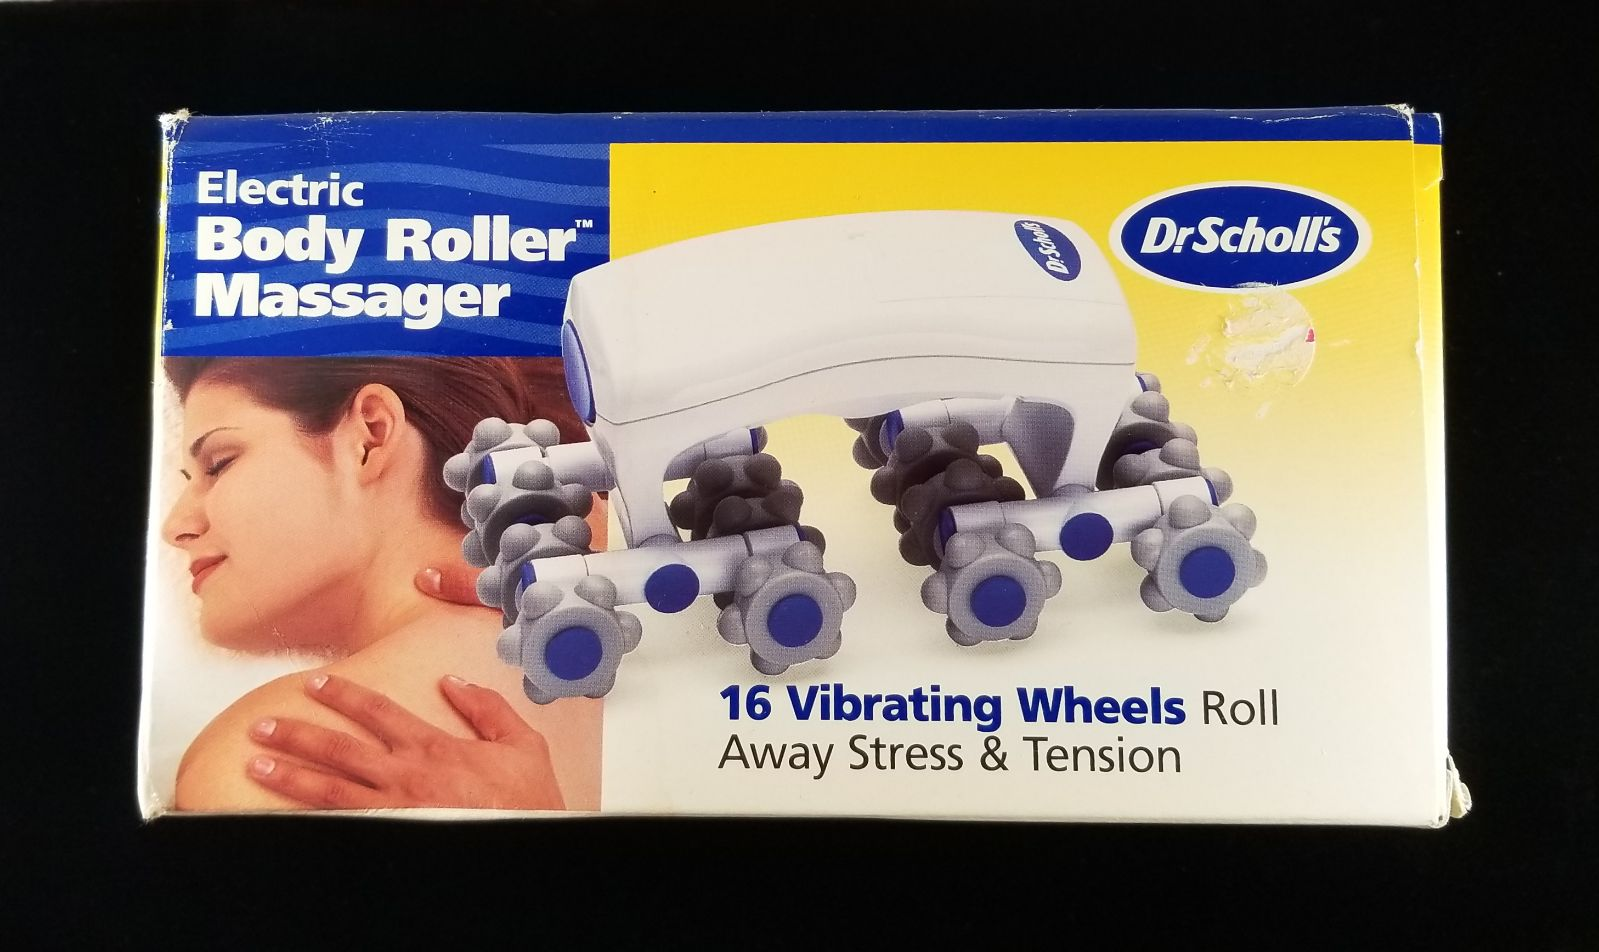 Dr Scholls Electric Body Roller Massager